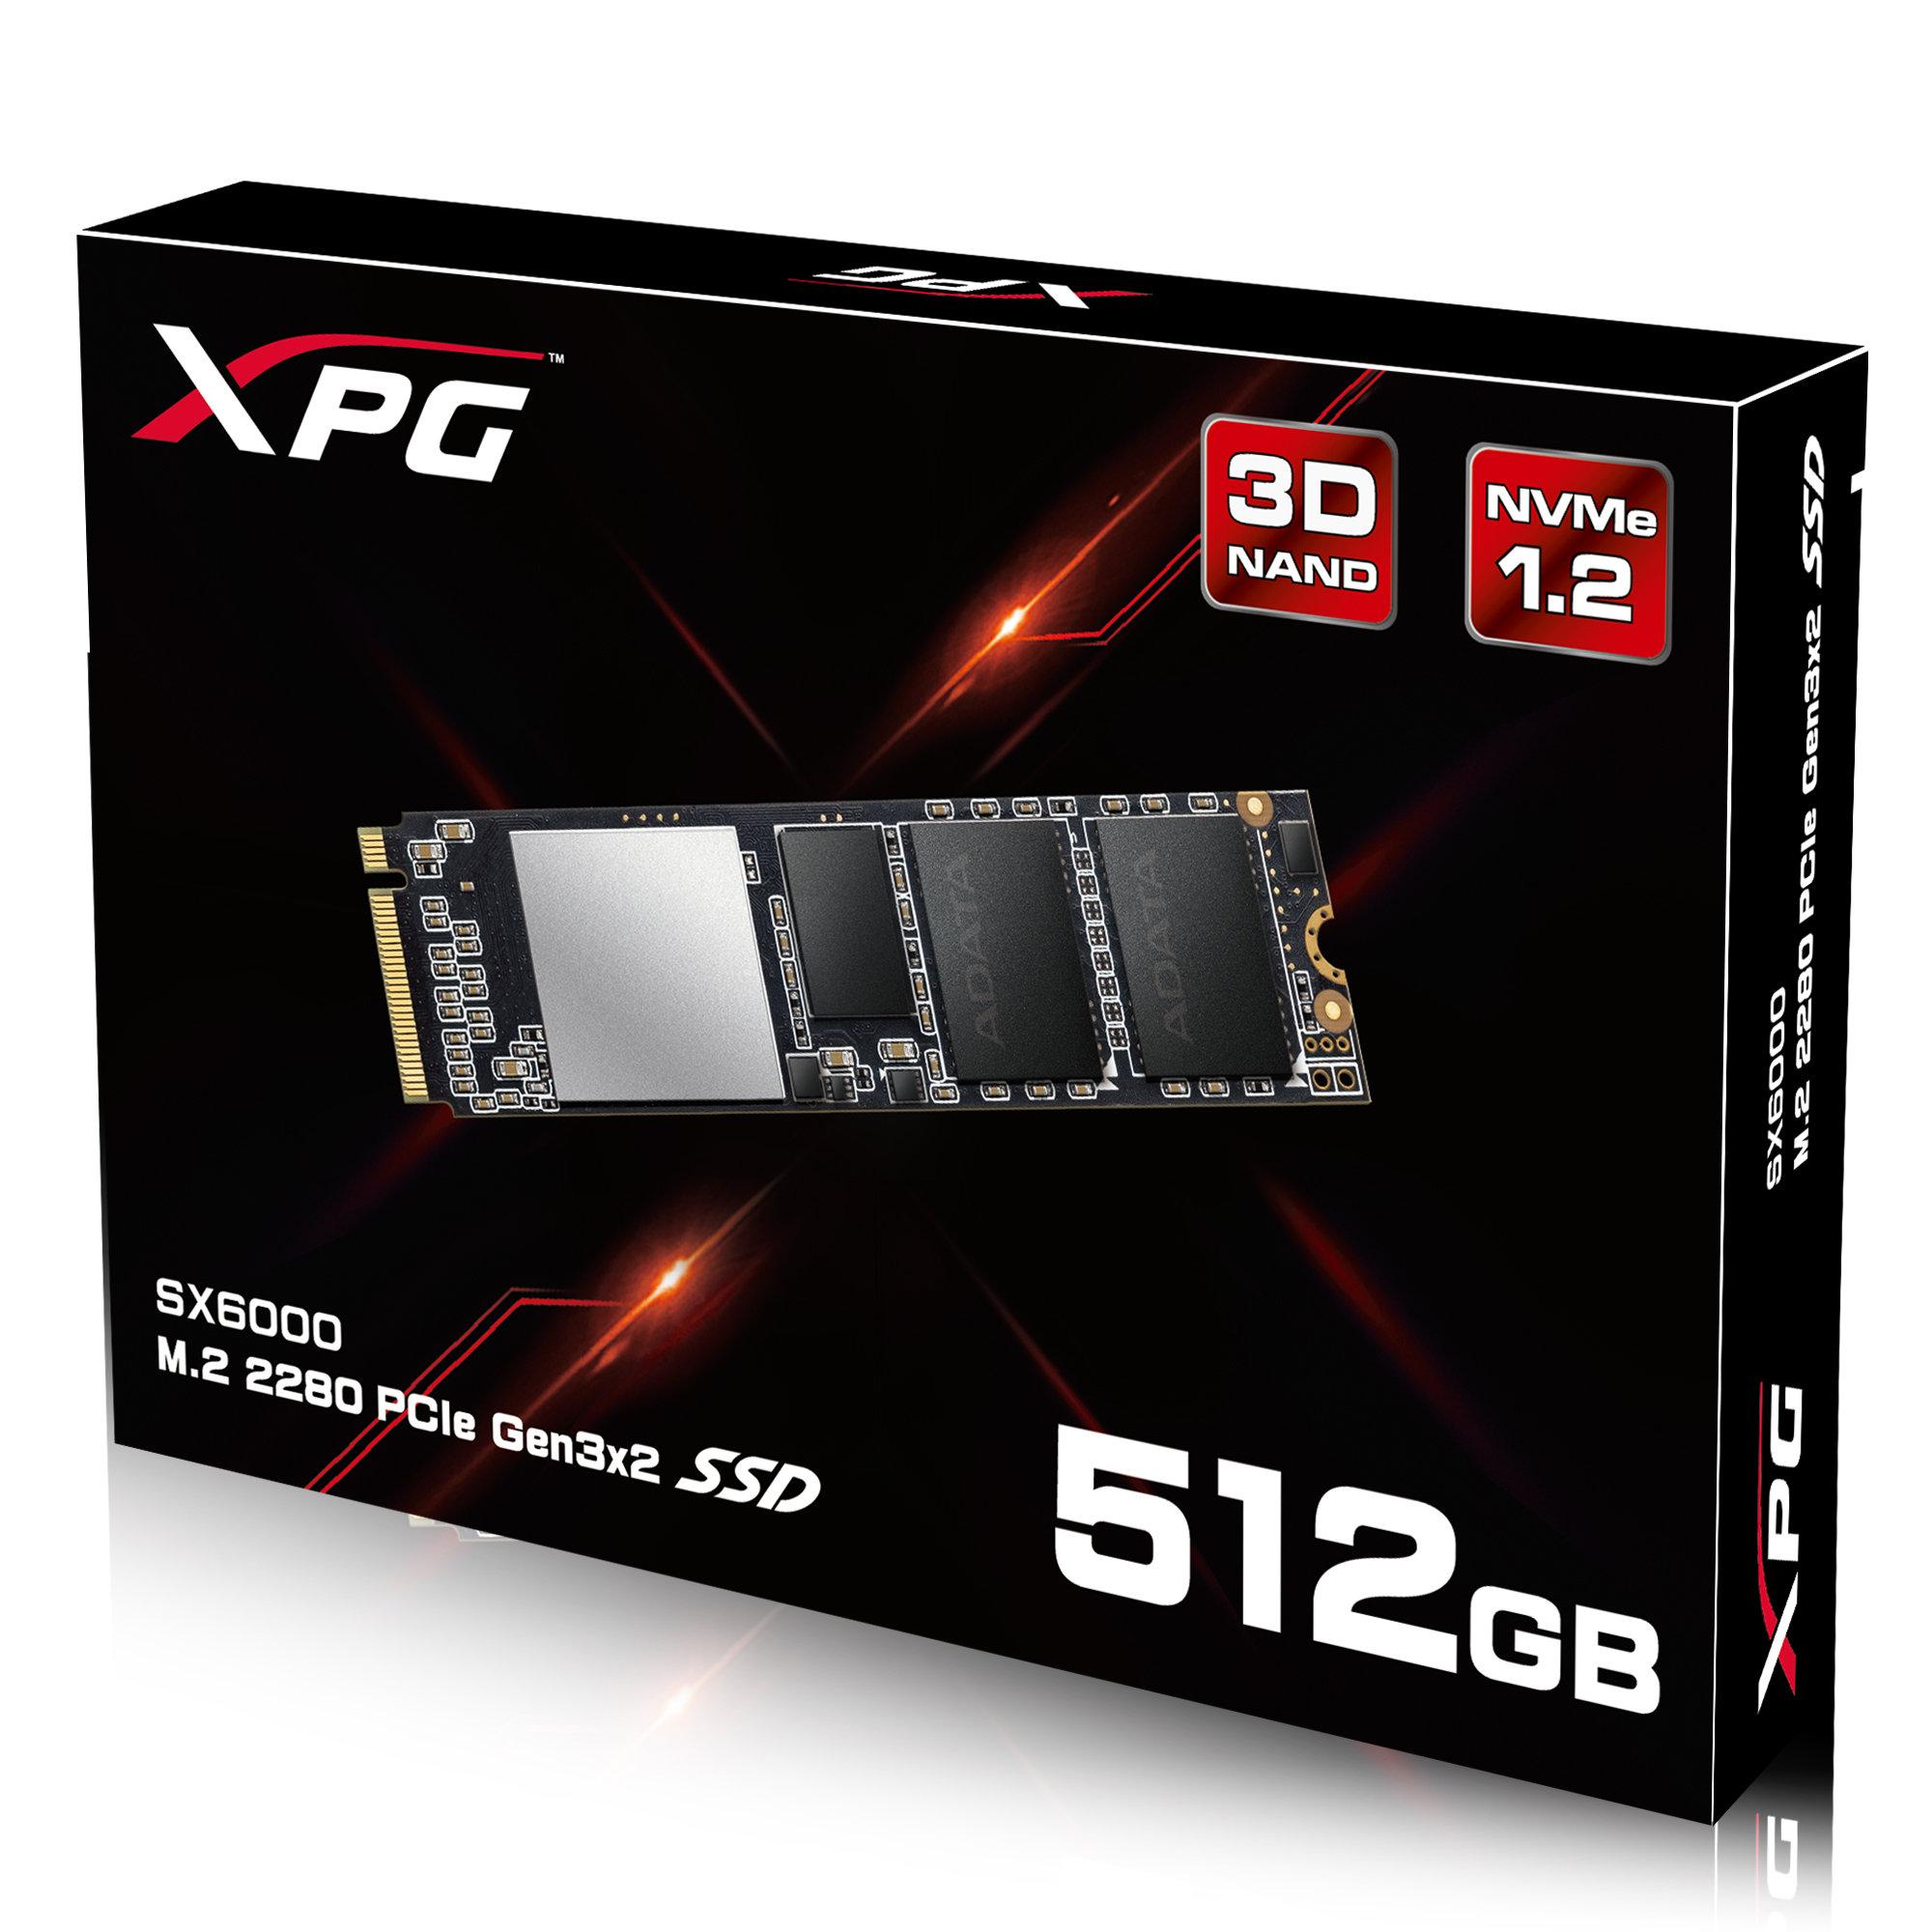 XPG SX6000 PCIE GEN3X2 M.2 2280 512GB SSD BY ADATA WITH DIY HEATSINK - 134.69 - with COUPON SAVE15 - RAKUTEN $134.69